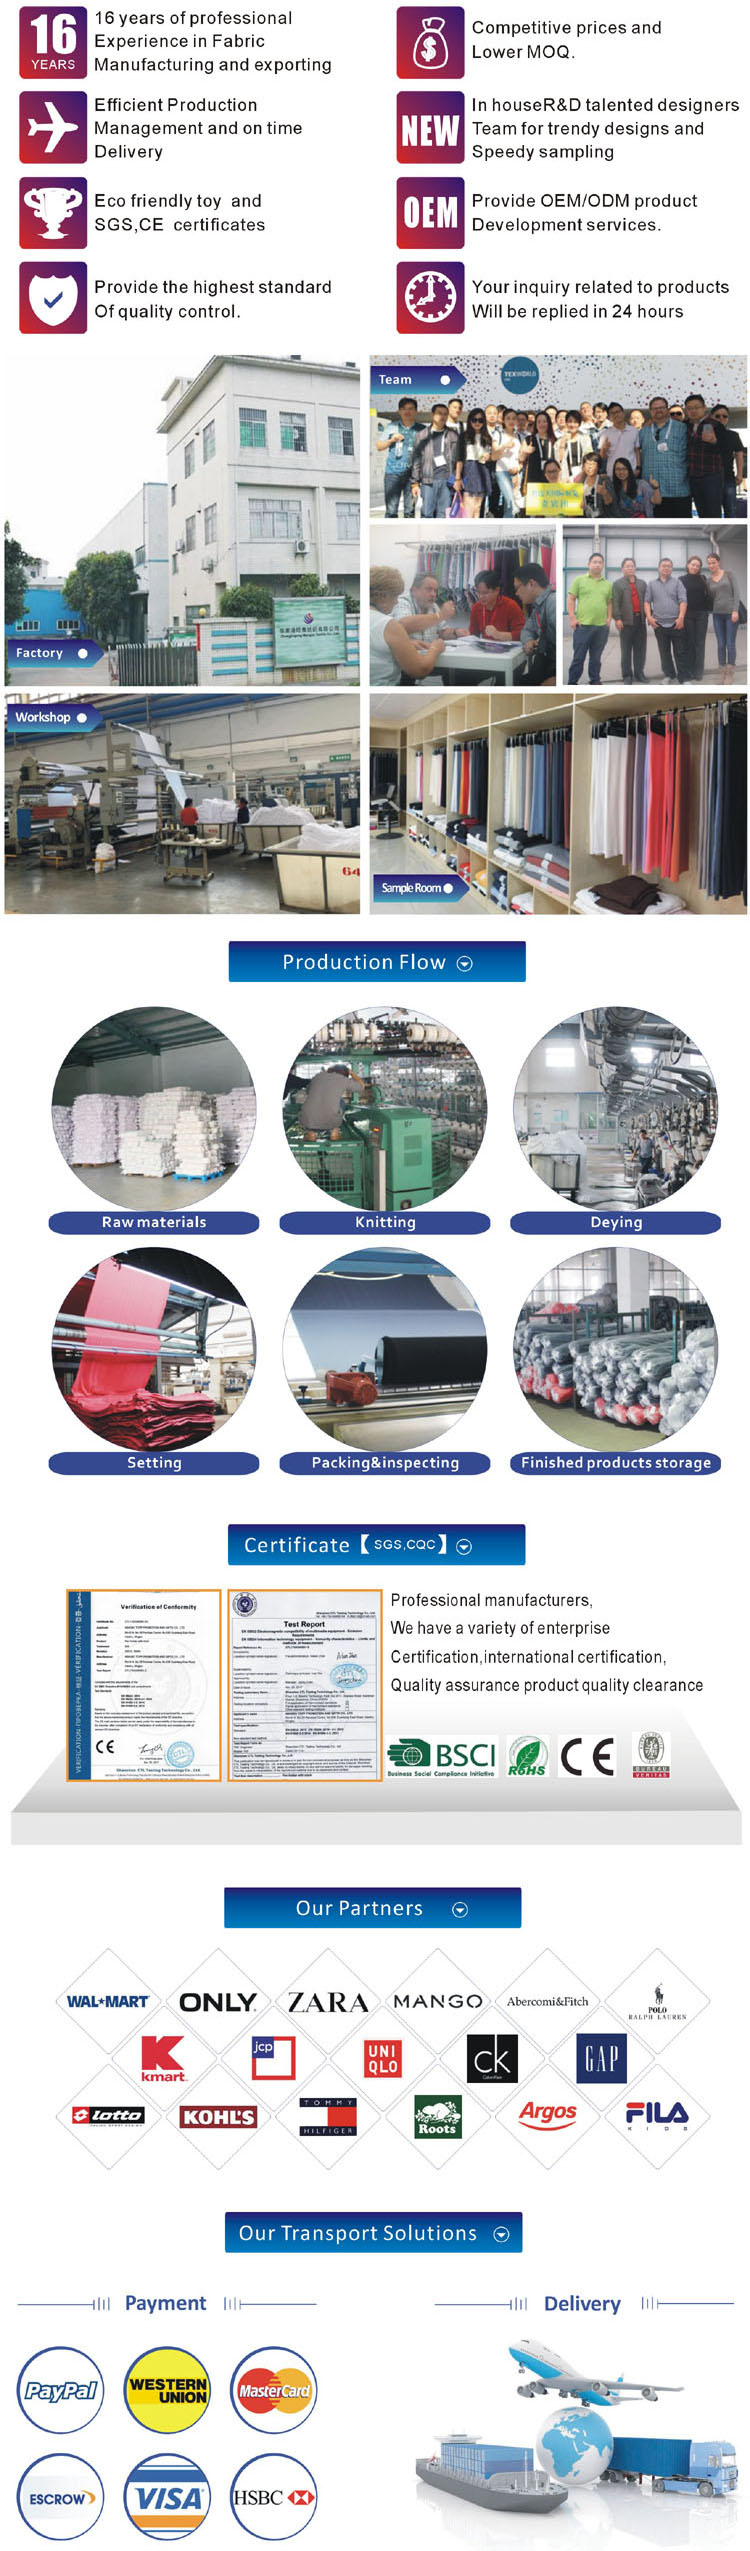 WANGT proveedor de China textil suave 100% poliéster servidumbre sherpa shu tela de terciopelo